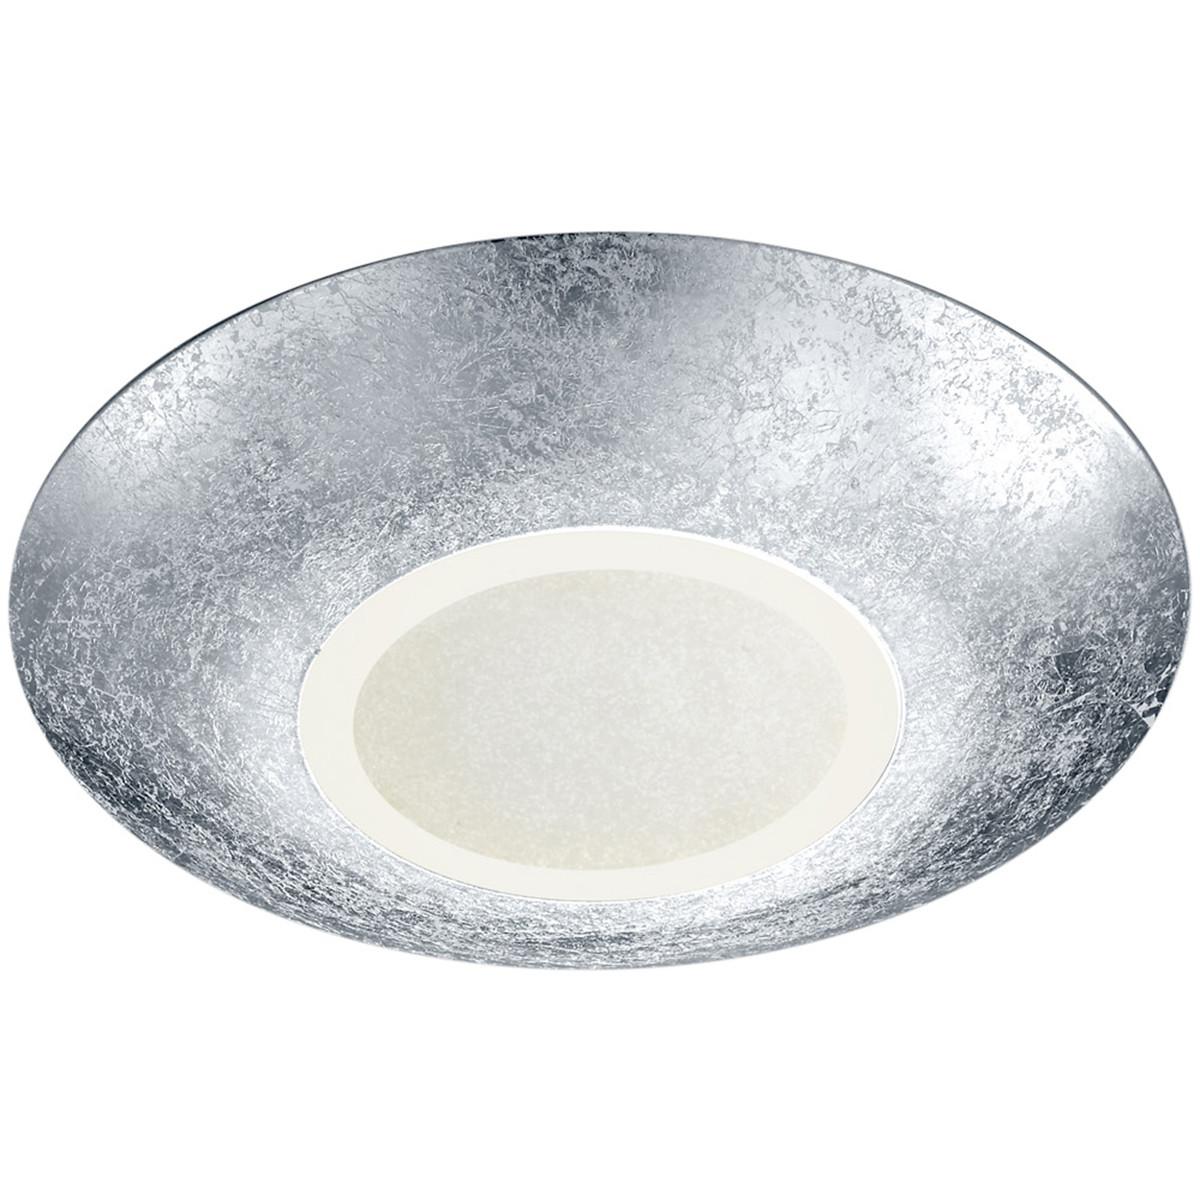 LED Plafondlamp - Plafondverlichting - Trion Cuno - 15W - Warm Wit 3000K - Rond - Mat Zilver - Alumi